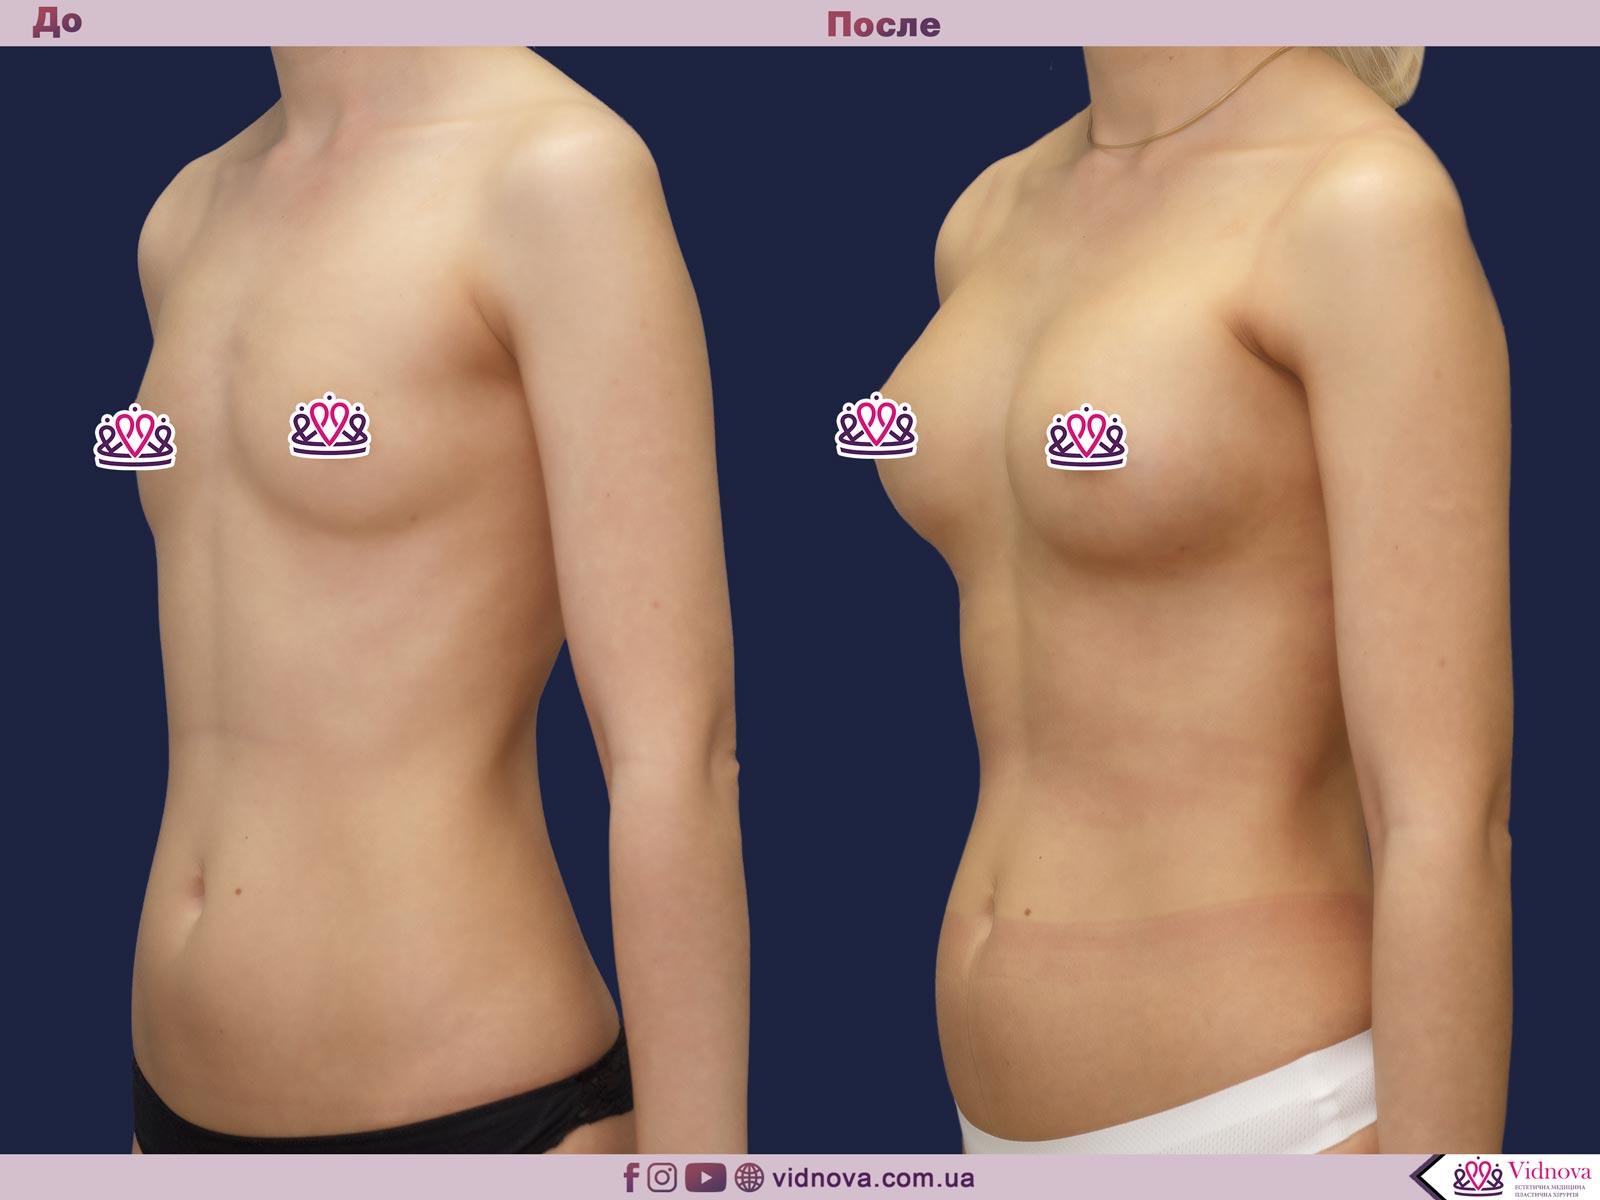 Увеличение груди: Фото ДО и ПОСЛЕ - Пример №63-2 - Клиника Vidnova